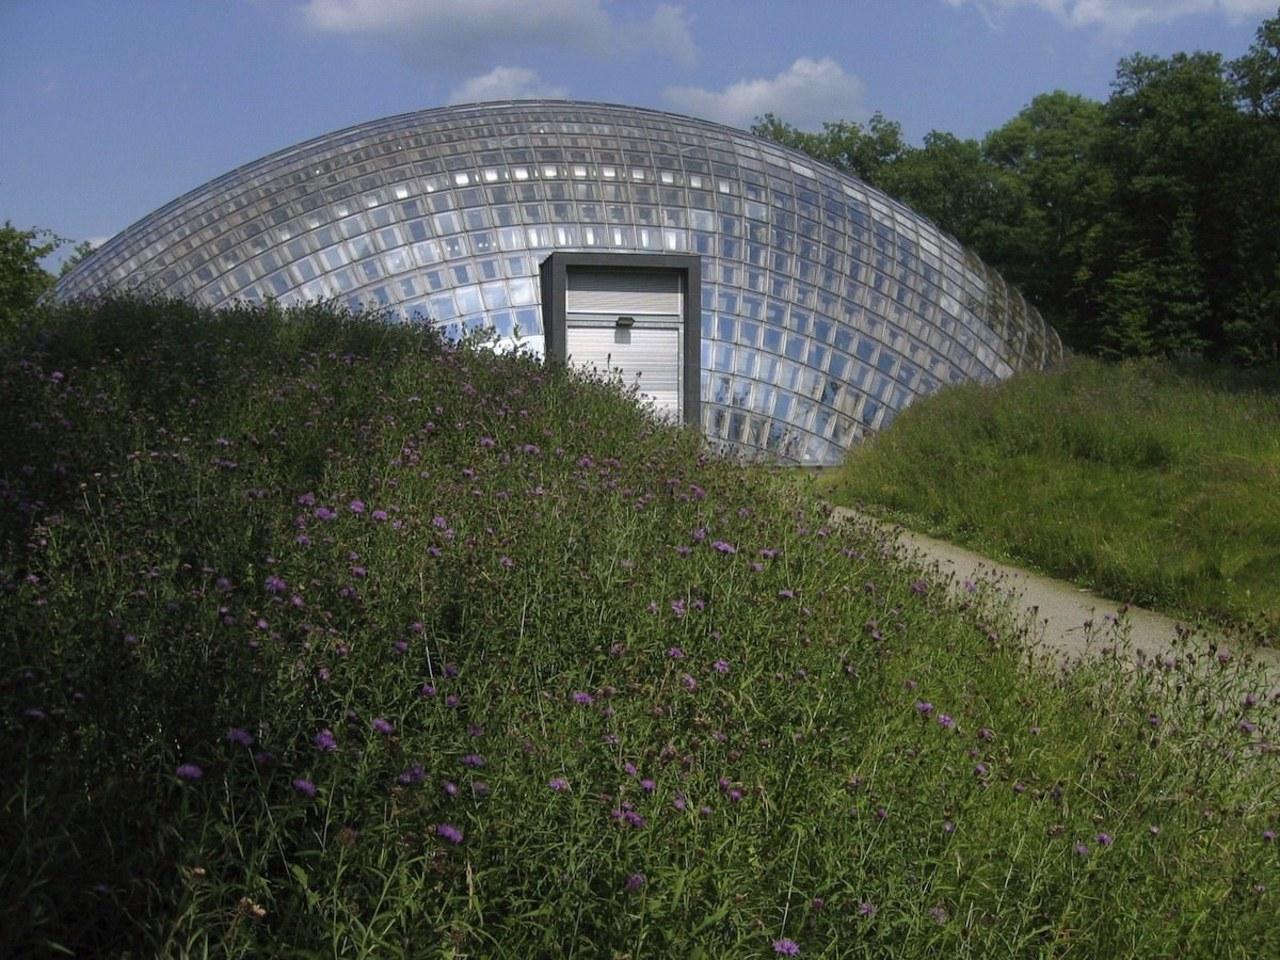 Forestry Branch – Marche-en-Famenne architecture, biome, garden, grass, greenhouse, meadow, plant, brown